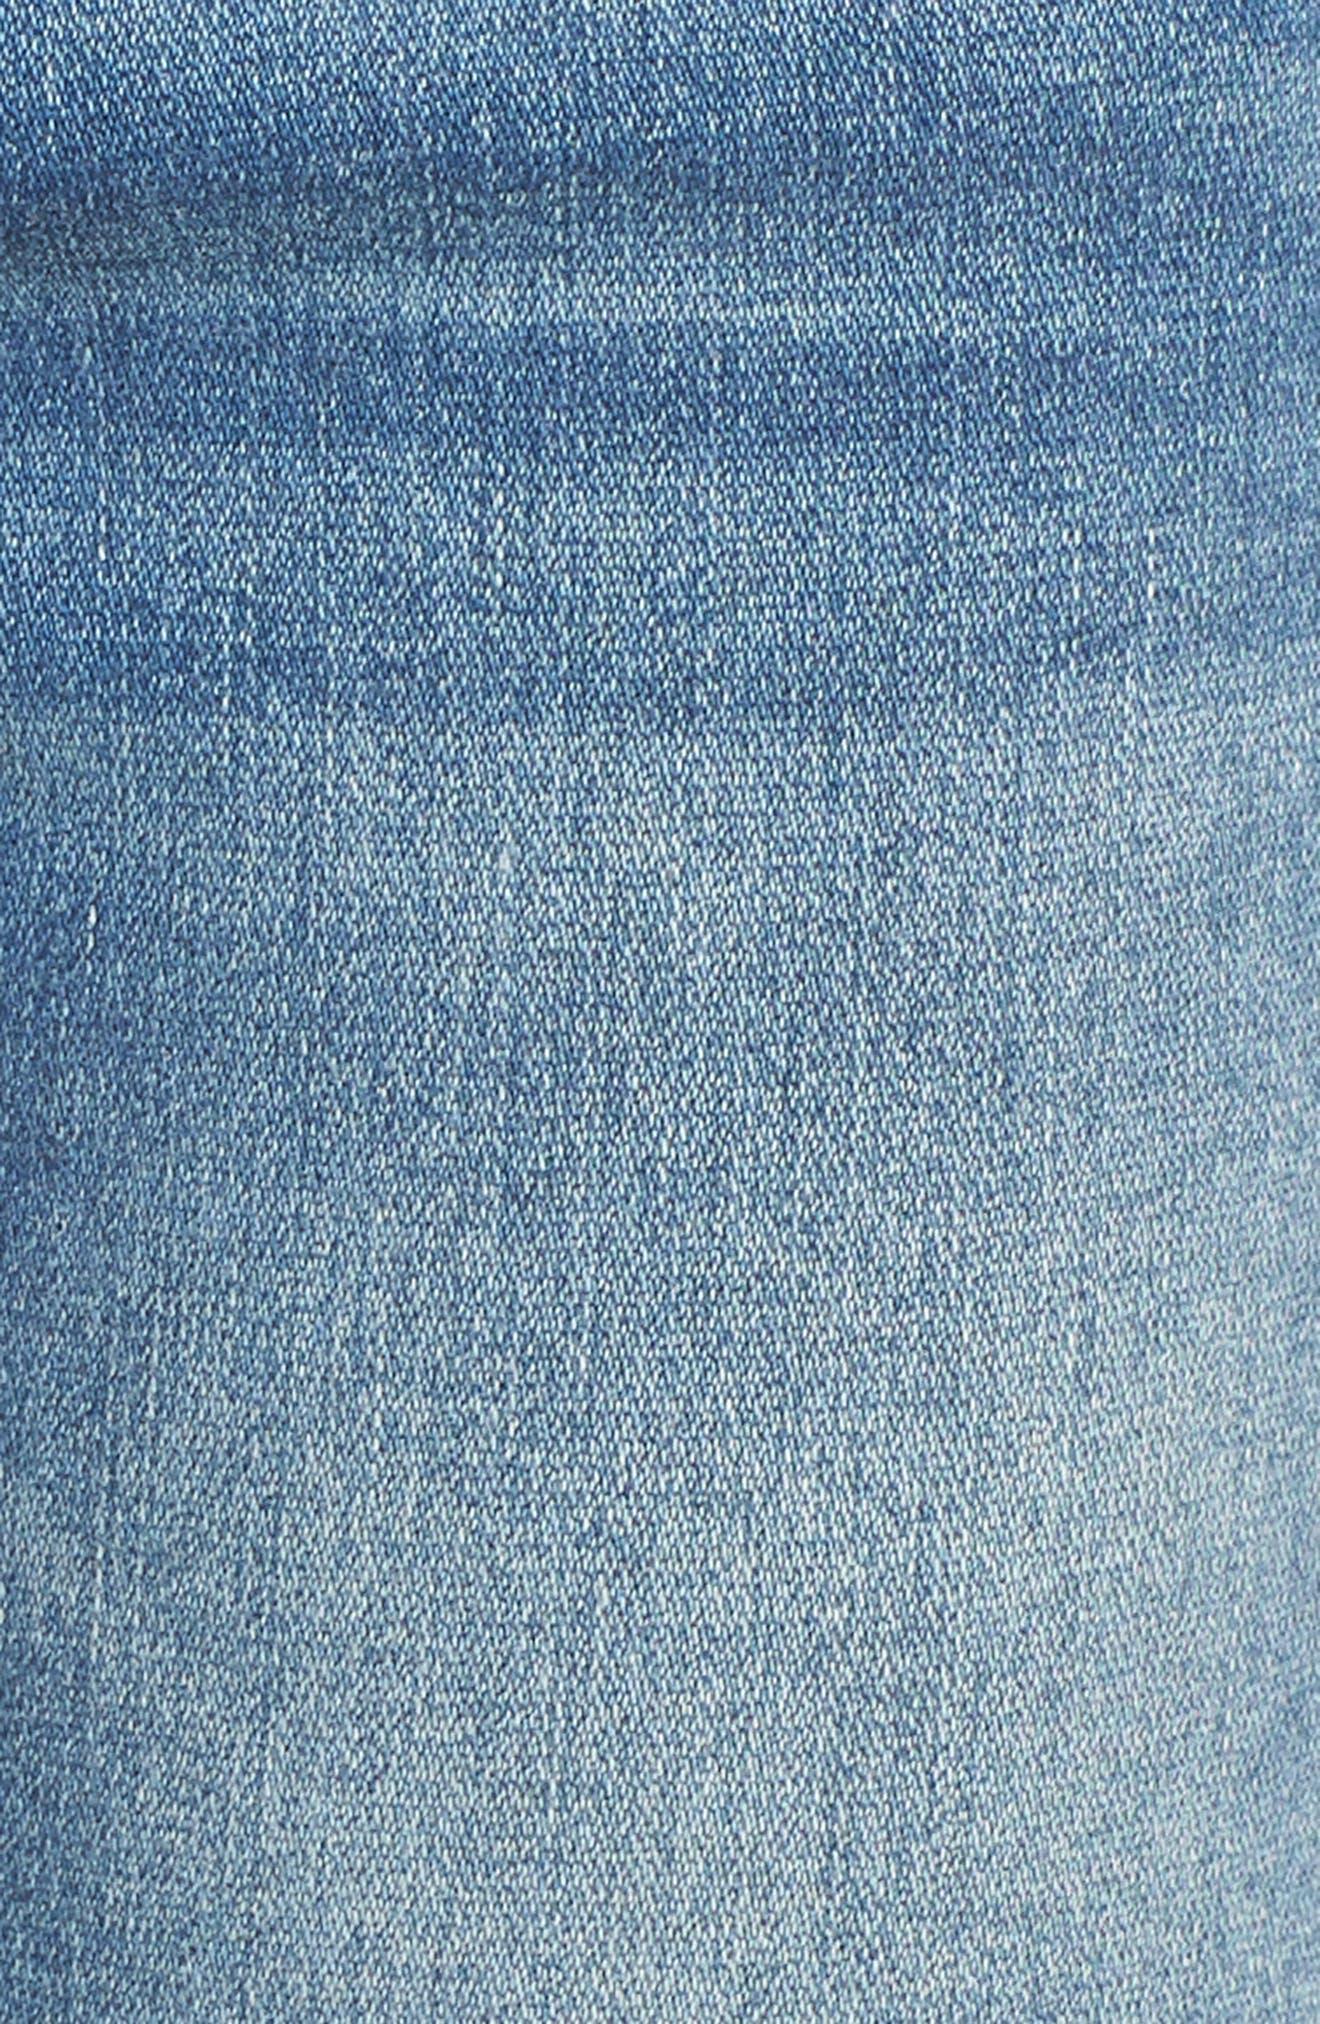 Marley Tulip Hem Ankle Skinny Jeans,                             Alternate thumbnail 6, color,                             Dark Wash